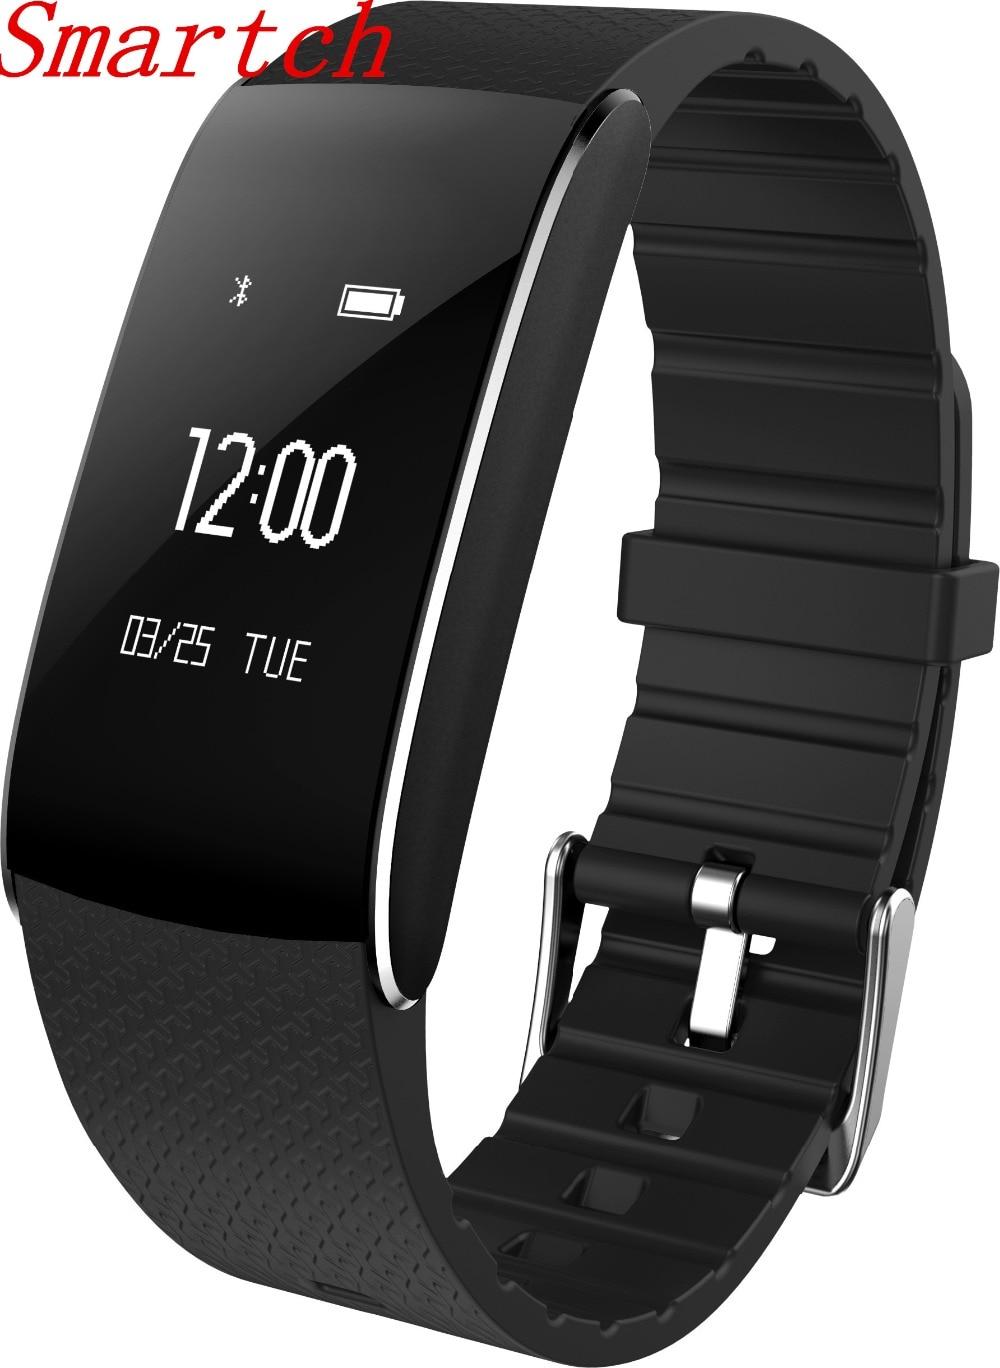 Smartch A86 Smart Bracelet heart rate monitor cardiaco watch Blood Pressure Blood Oxygen Smart wristband IP67